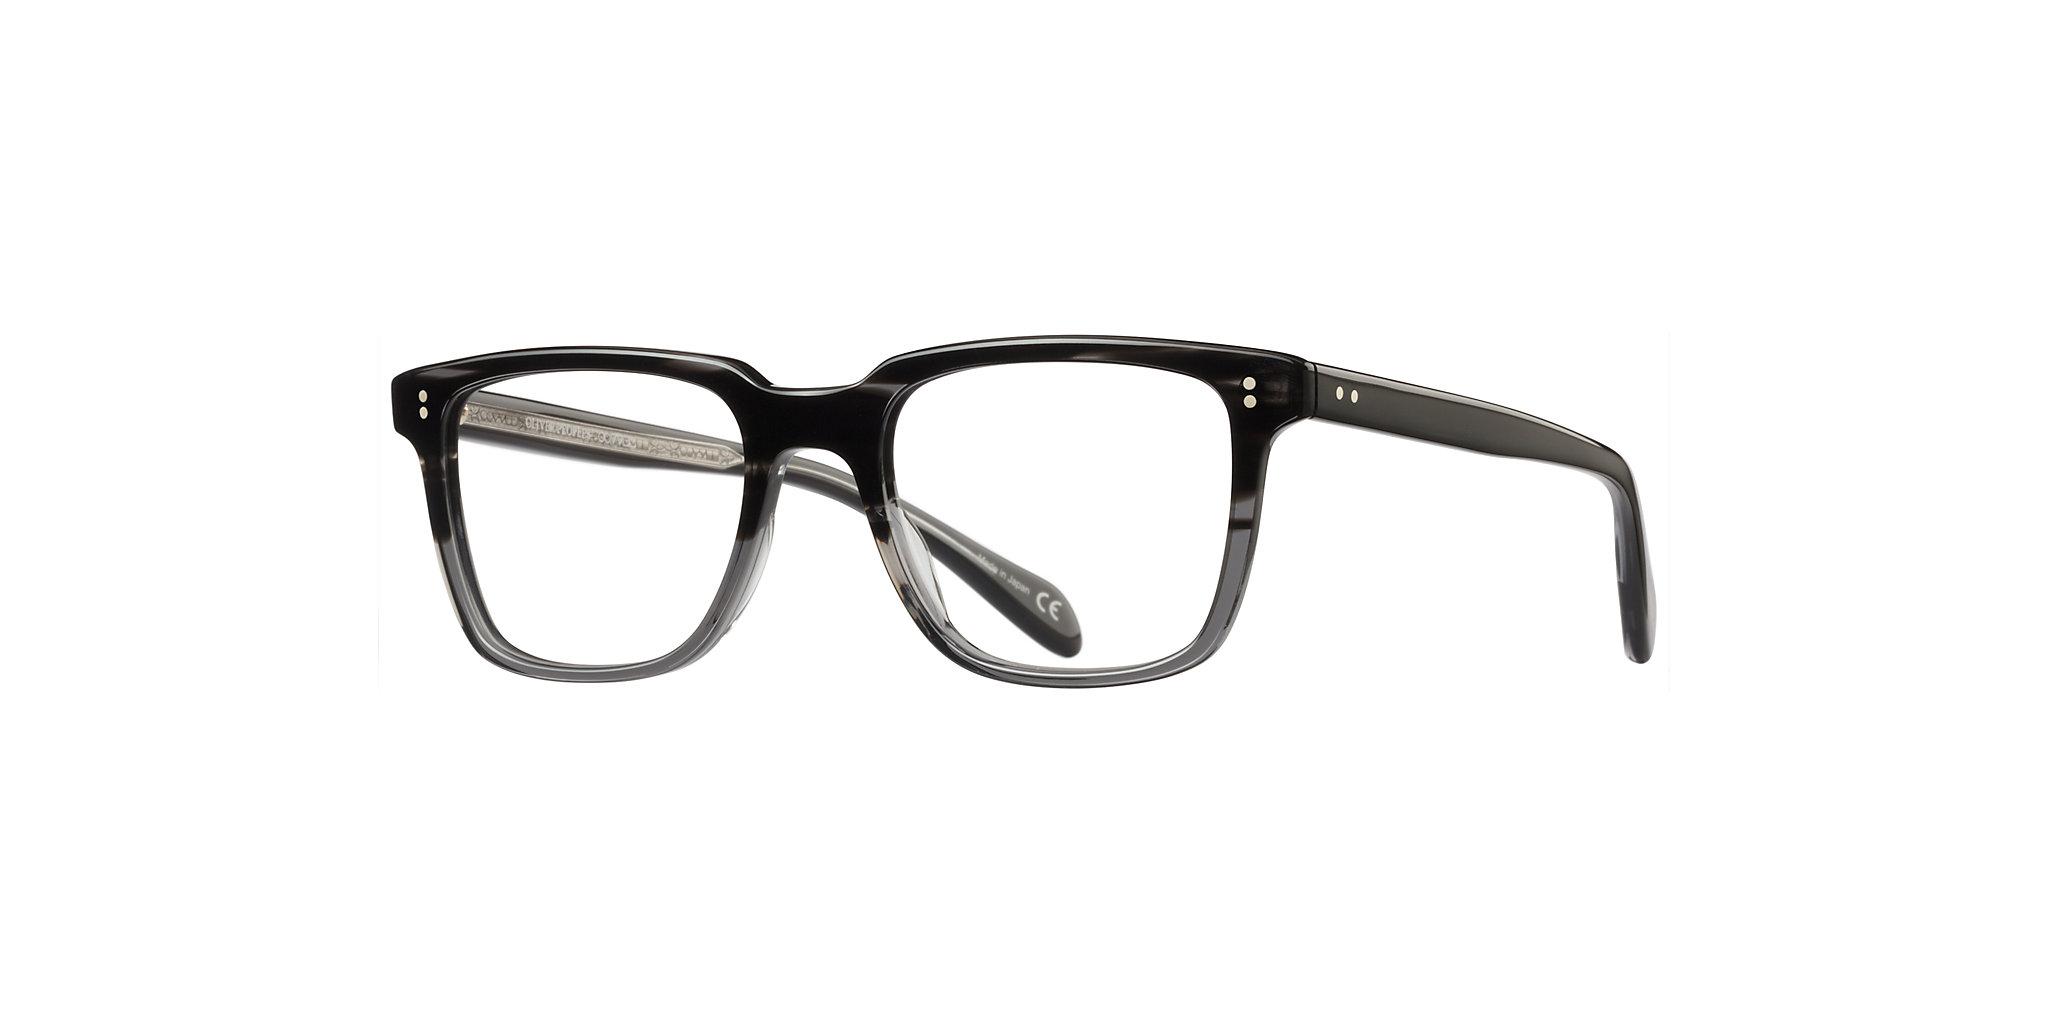 Oliver People's - Occhiale da Vista Uomo, NDG-1, Black/Grey - Storm OV5031 4261 C50